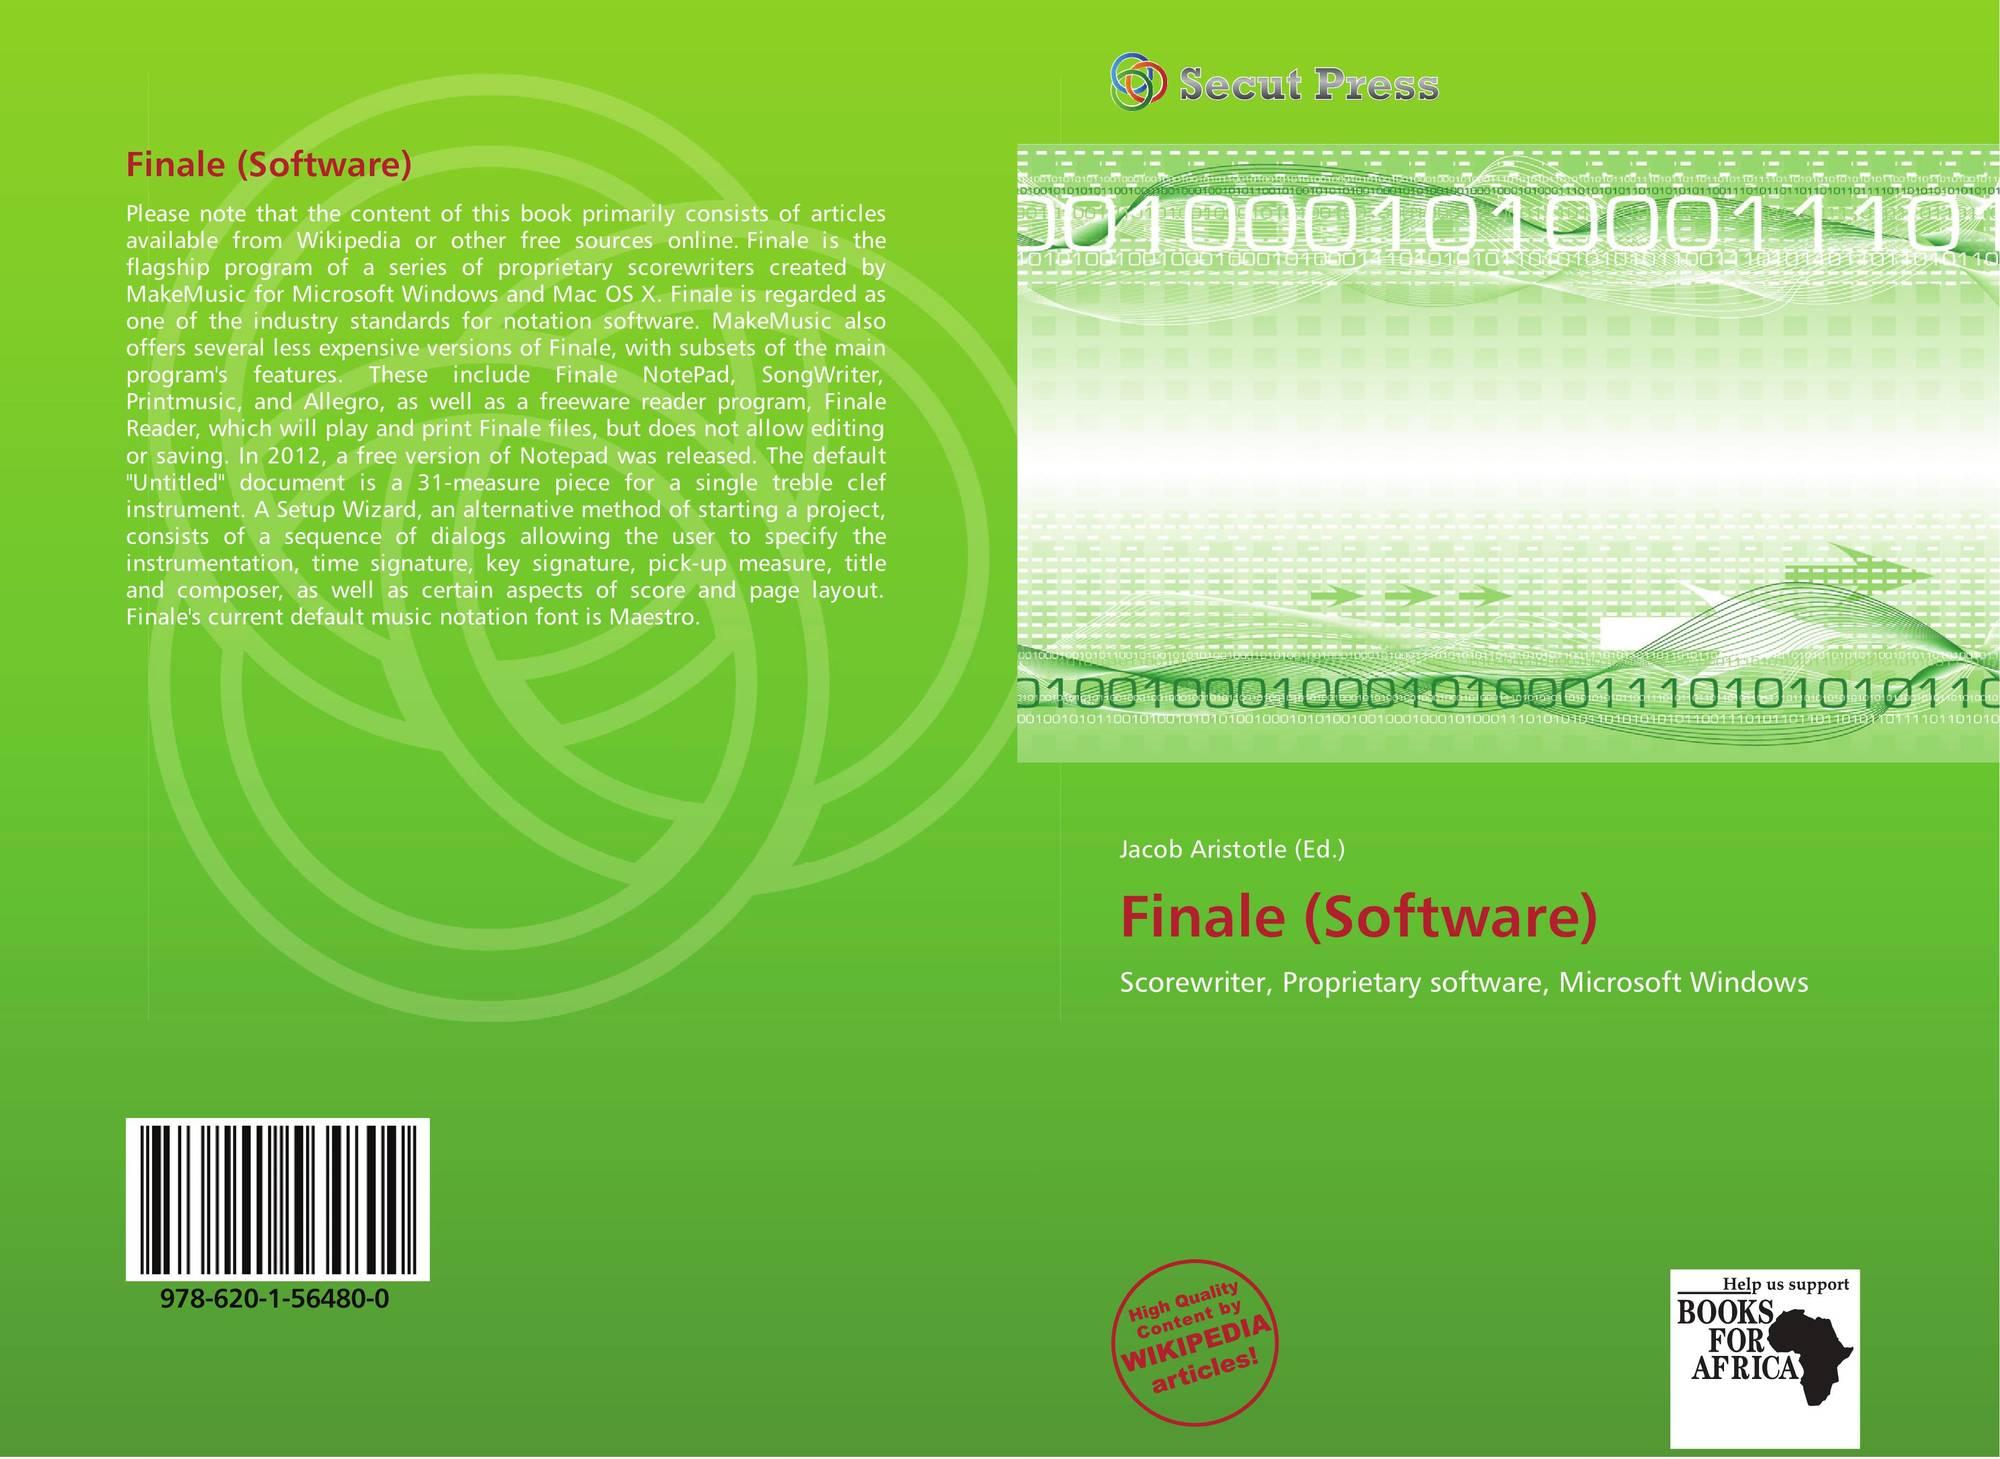 Finale (Software), 978-620-1-56480-0, 6201564802 ,9786201564800